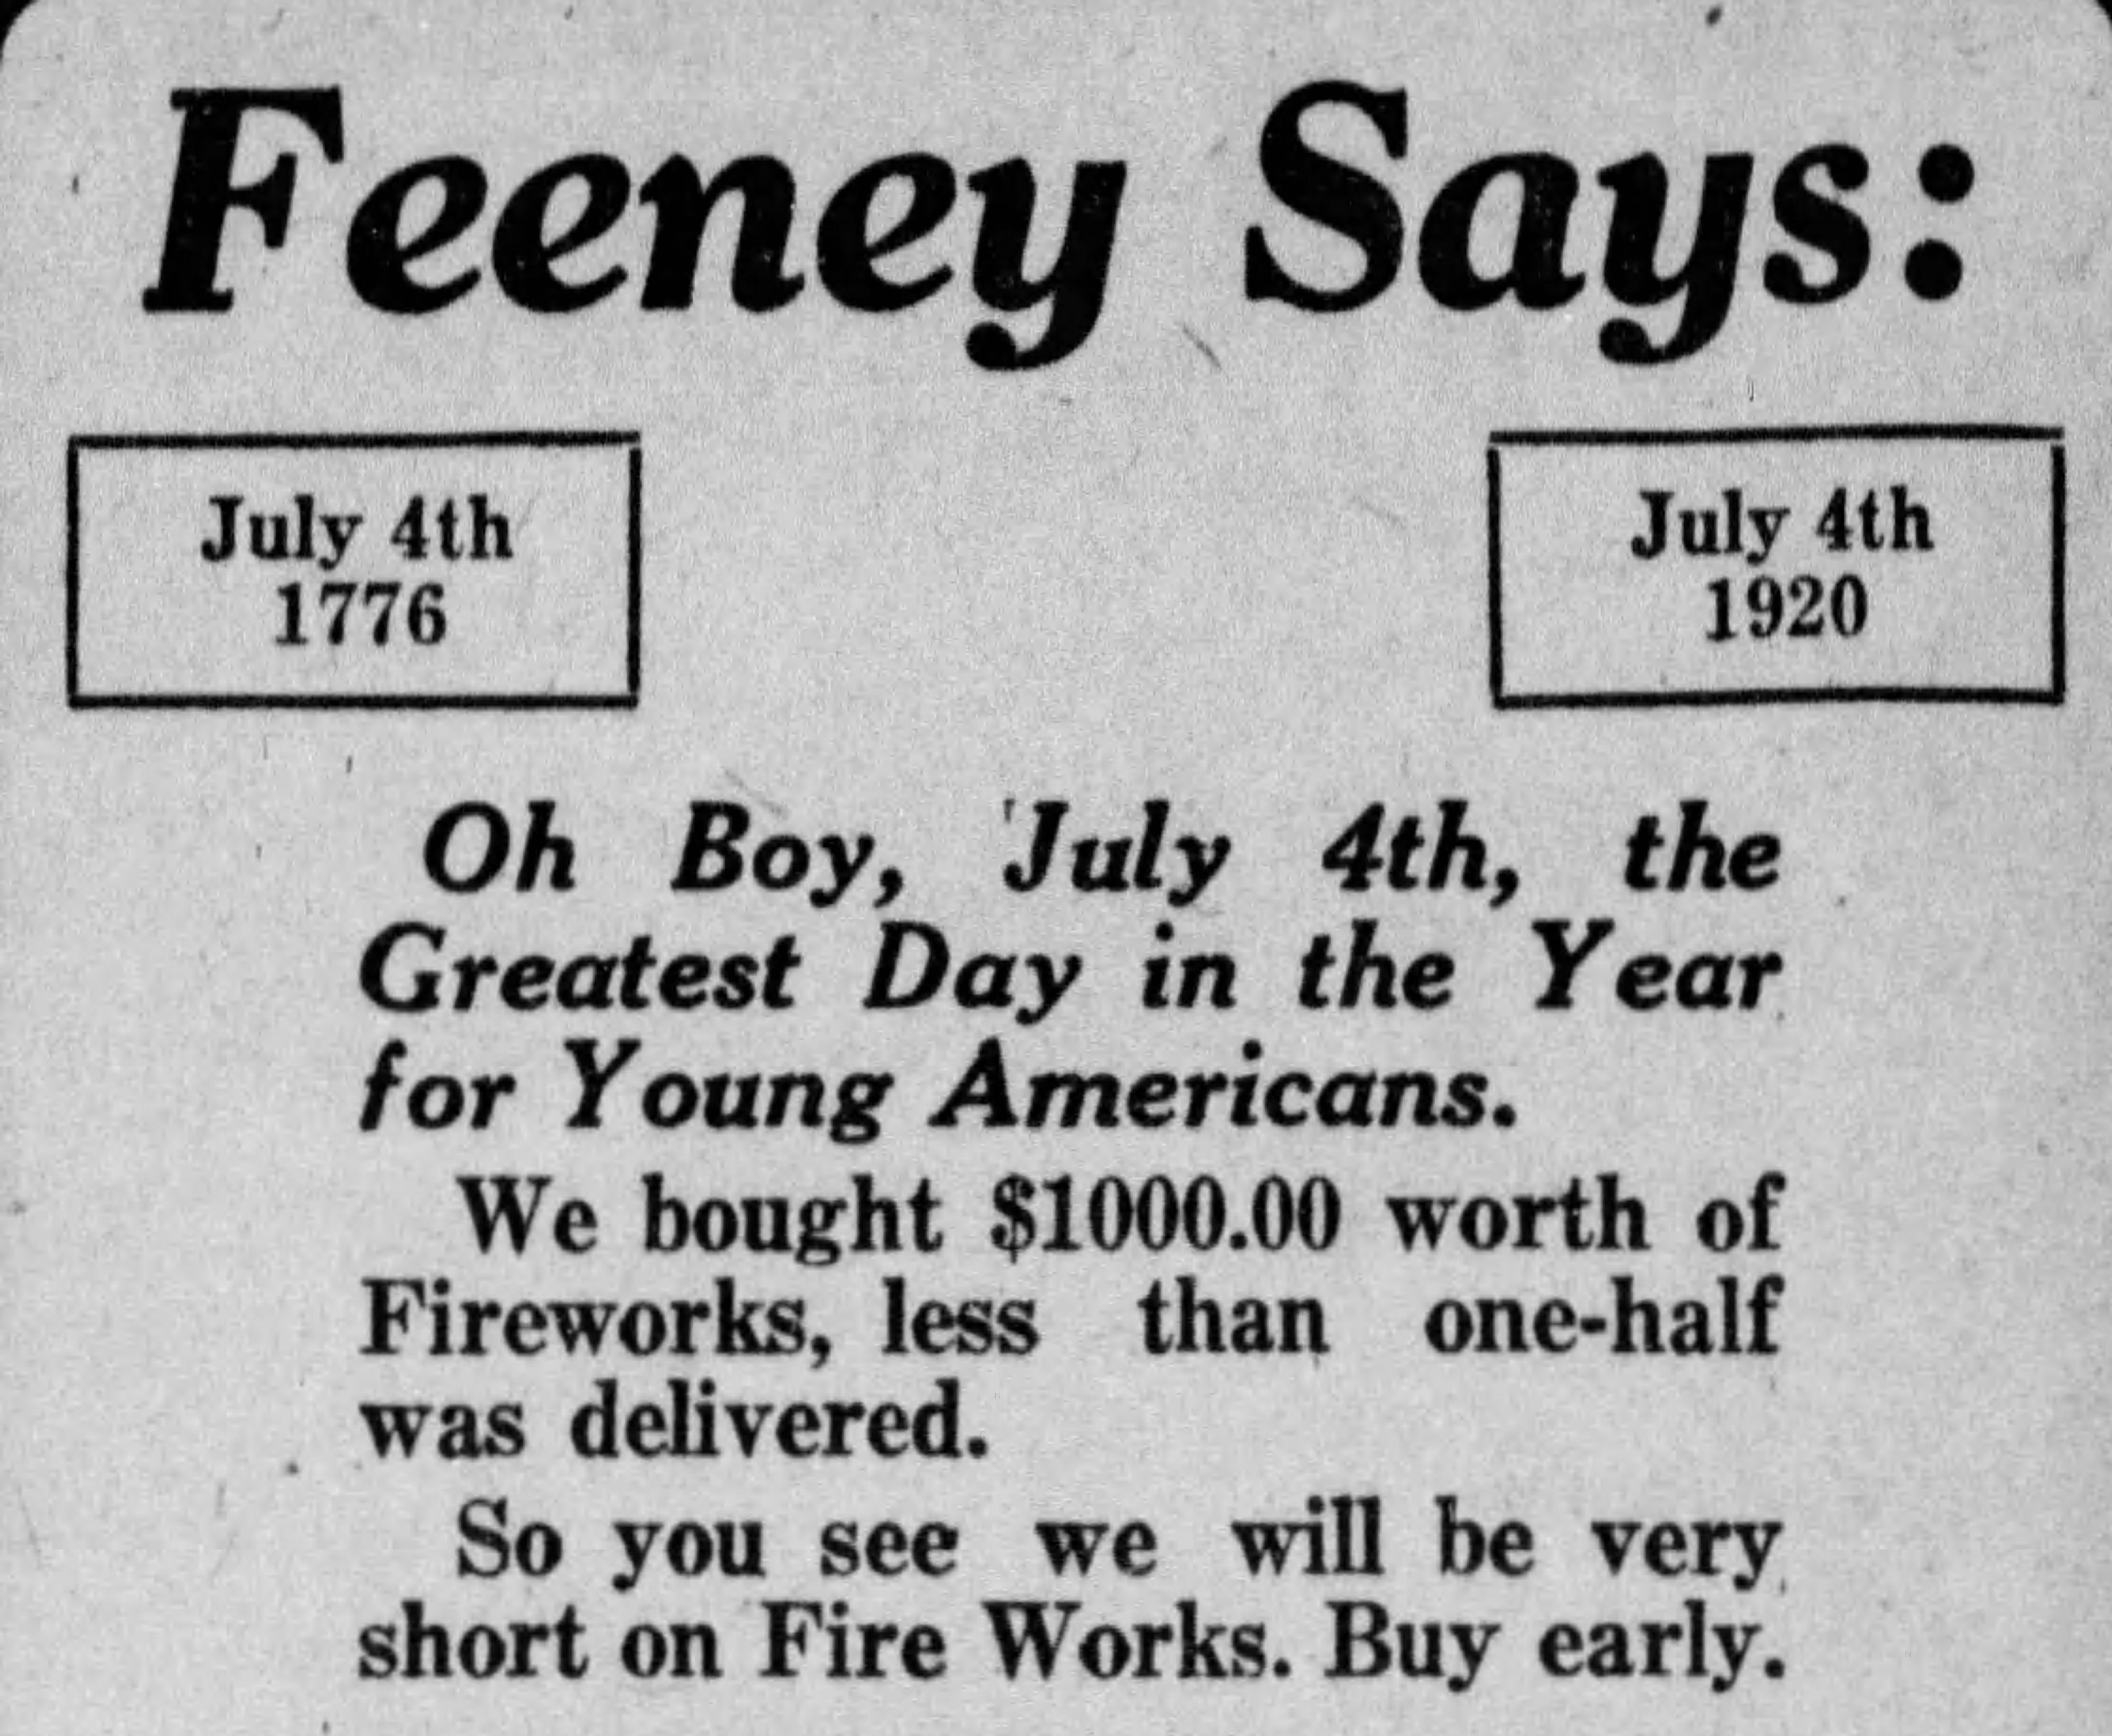 The_Daily_Times_Fri__Jul_2__1920_p22